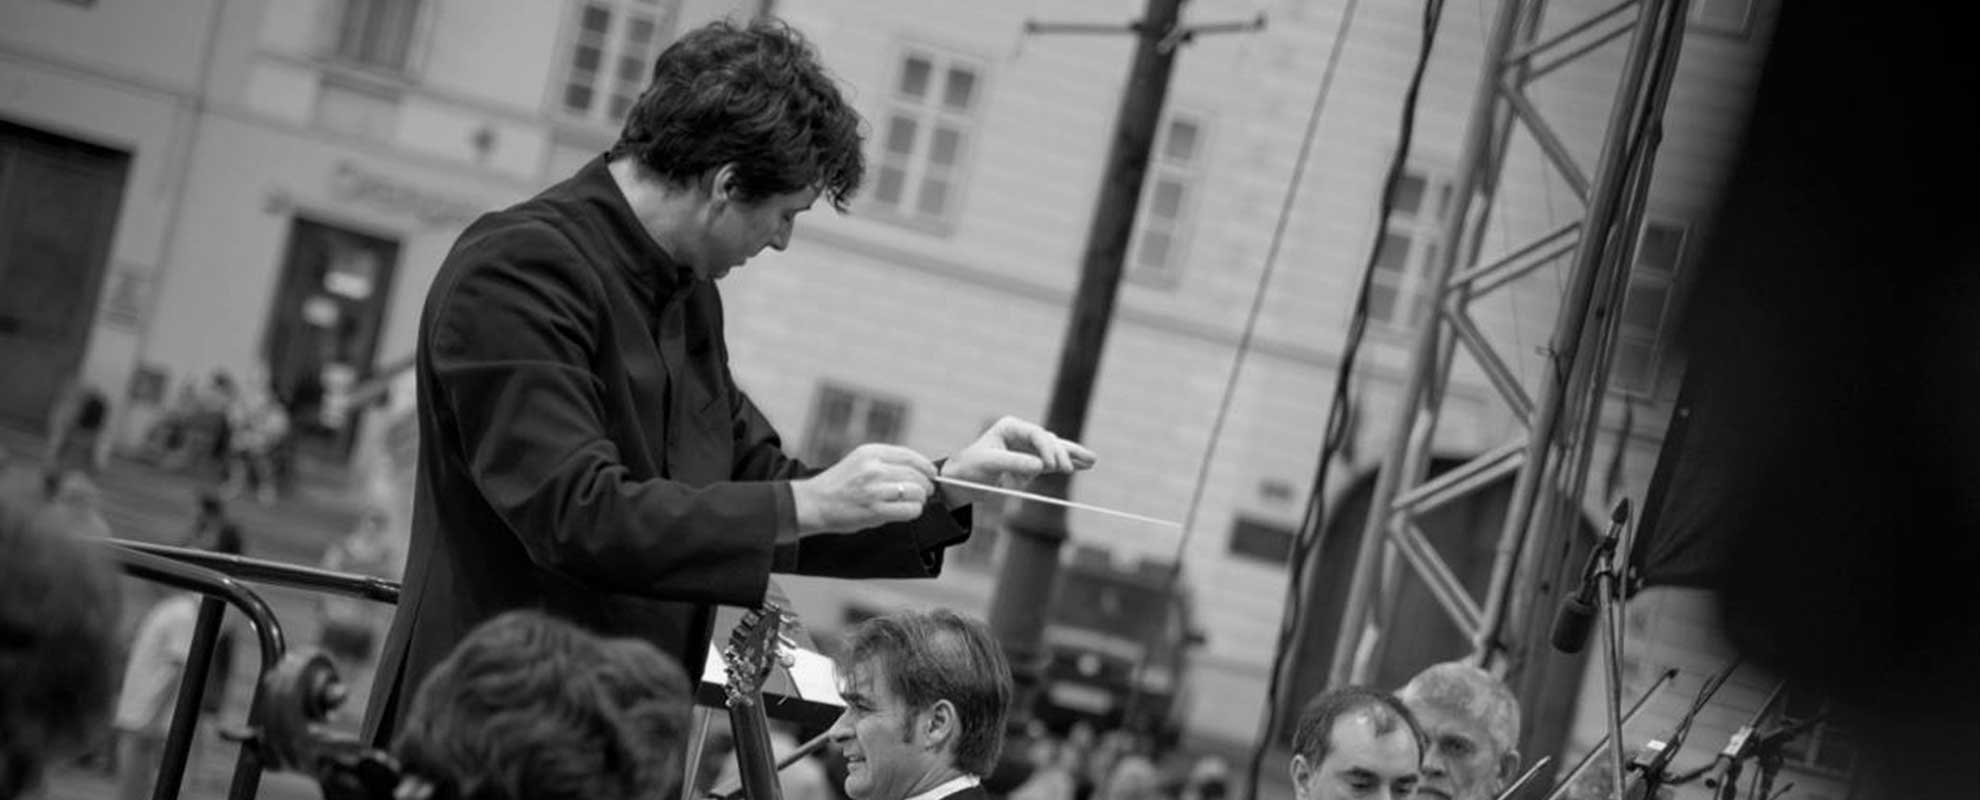 musica-clásica-problema-educación